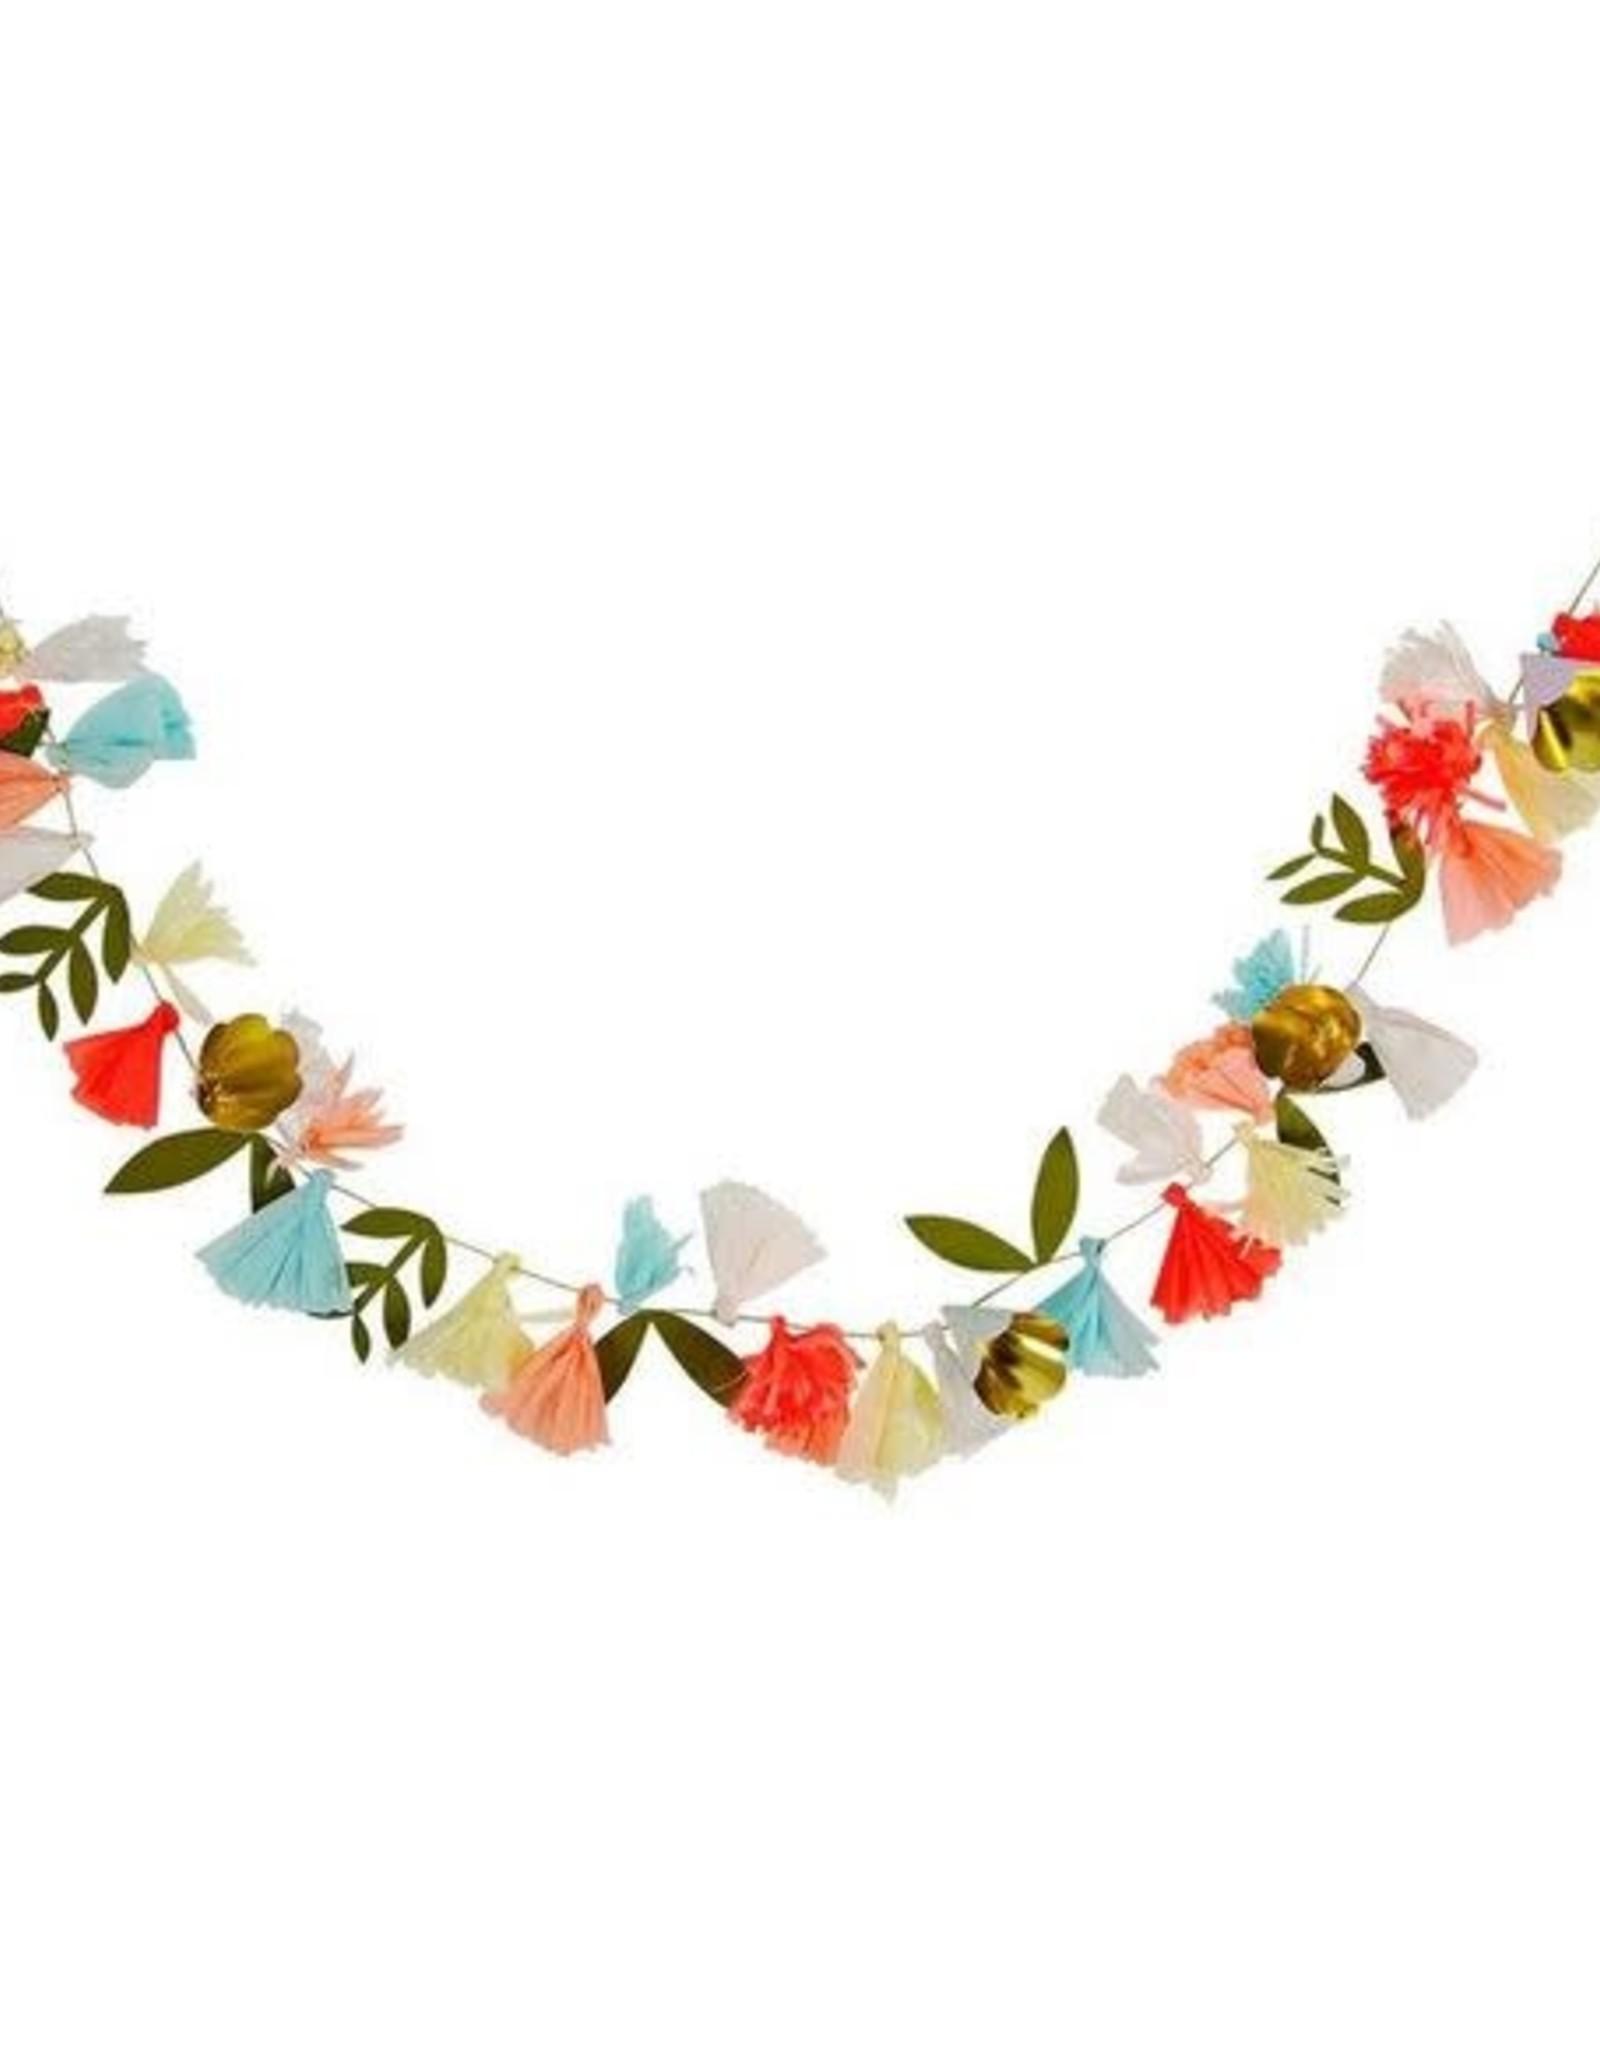 Meri Meri Guirlande - Bouquet de Fleurs